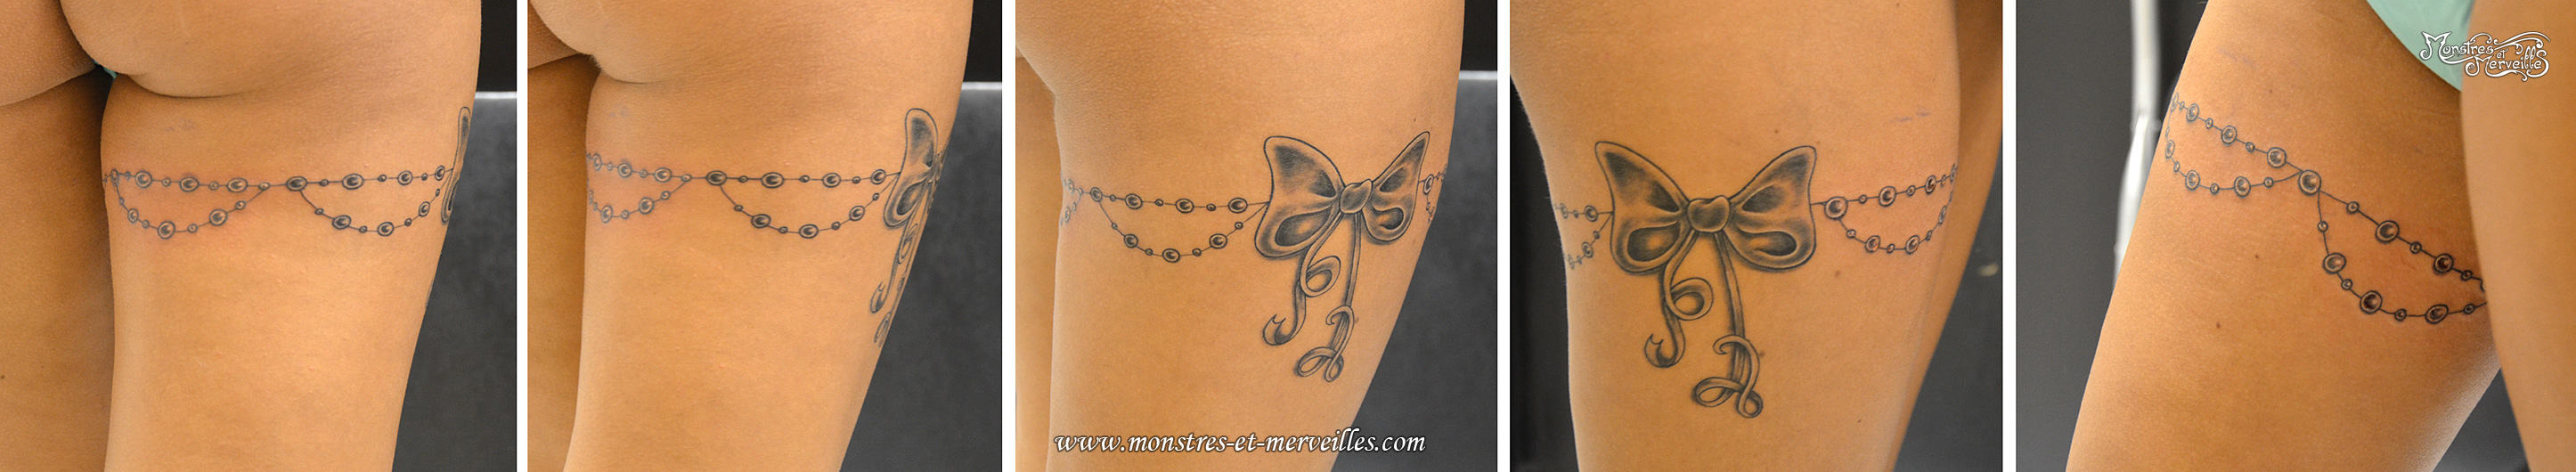 tatouage cuisse femme jarreti re noeud. Black Bedroom Furniture Sets. Home Design Ideas